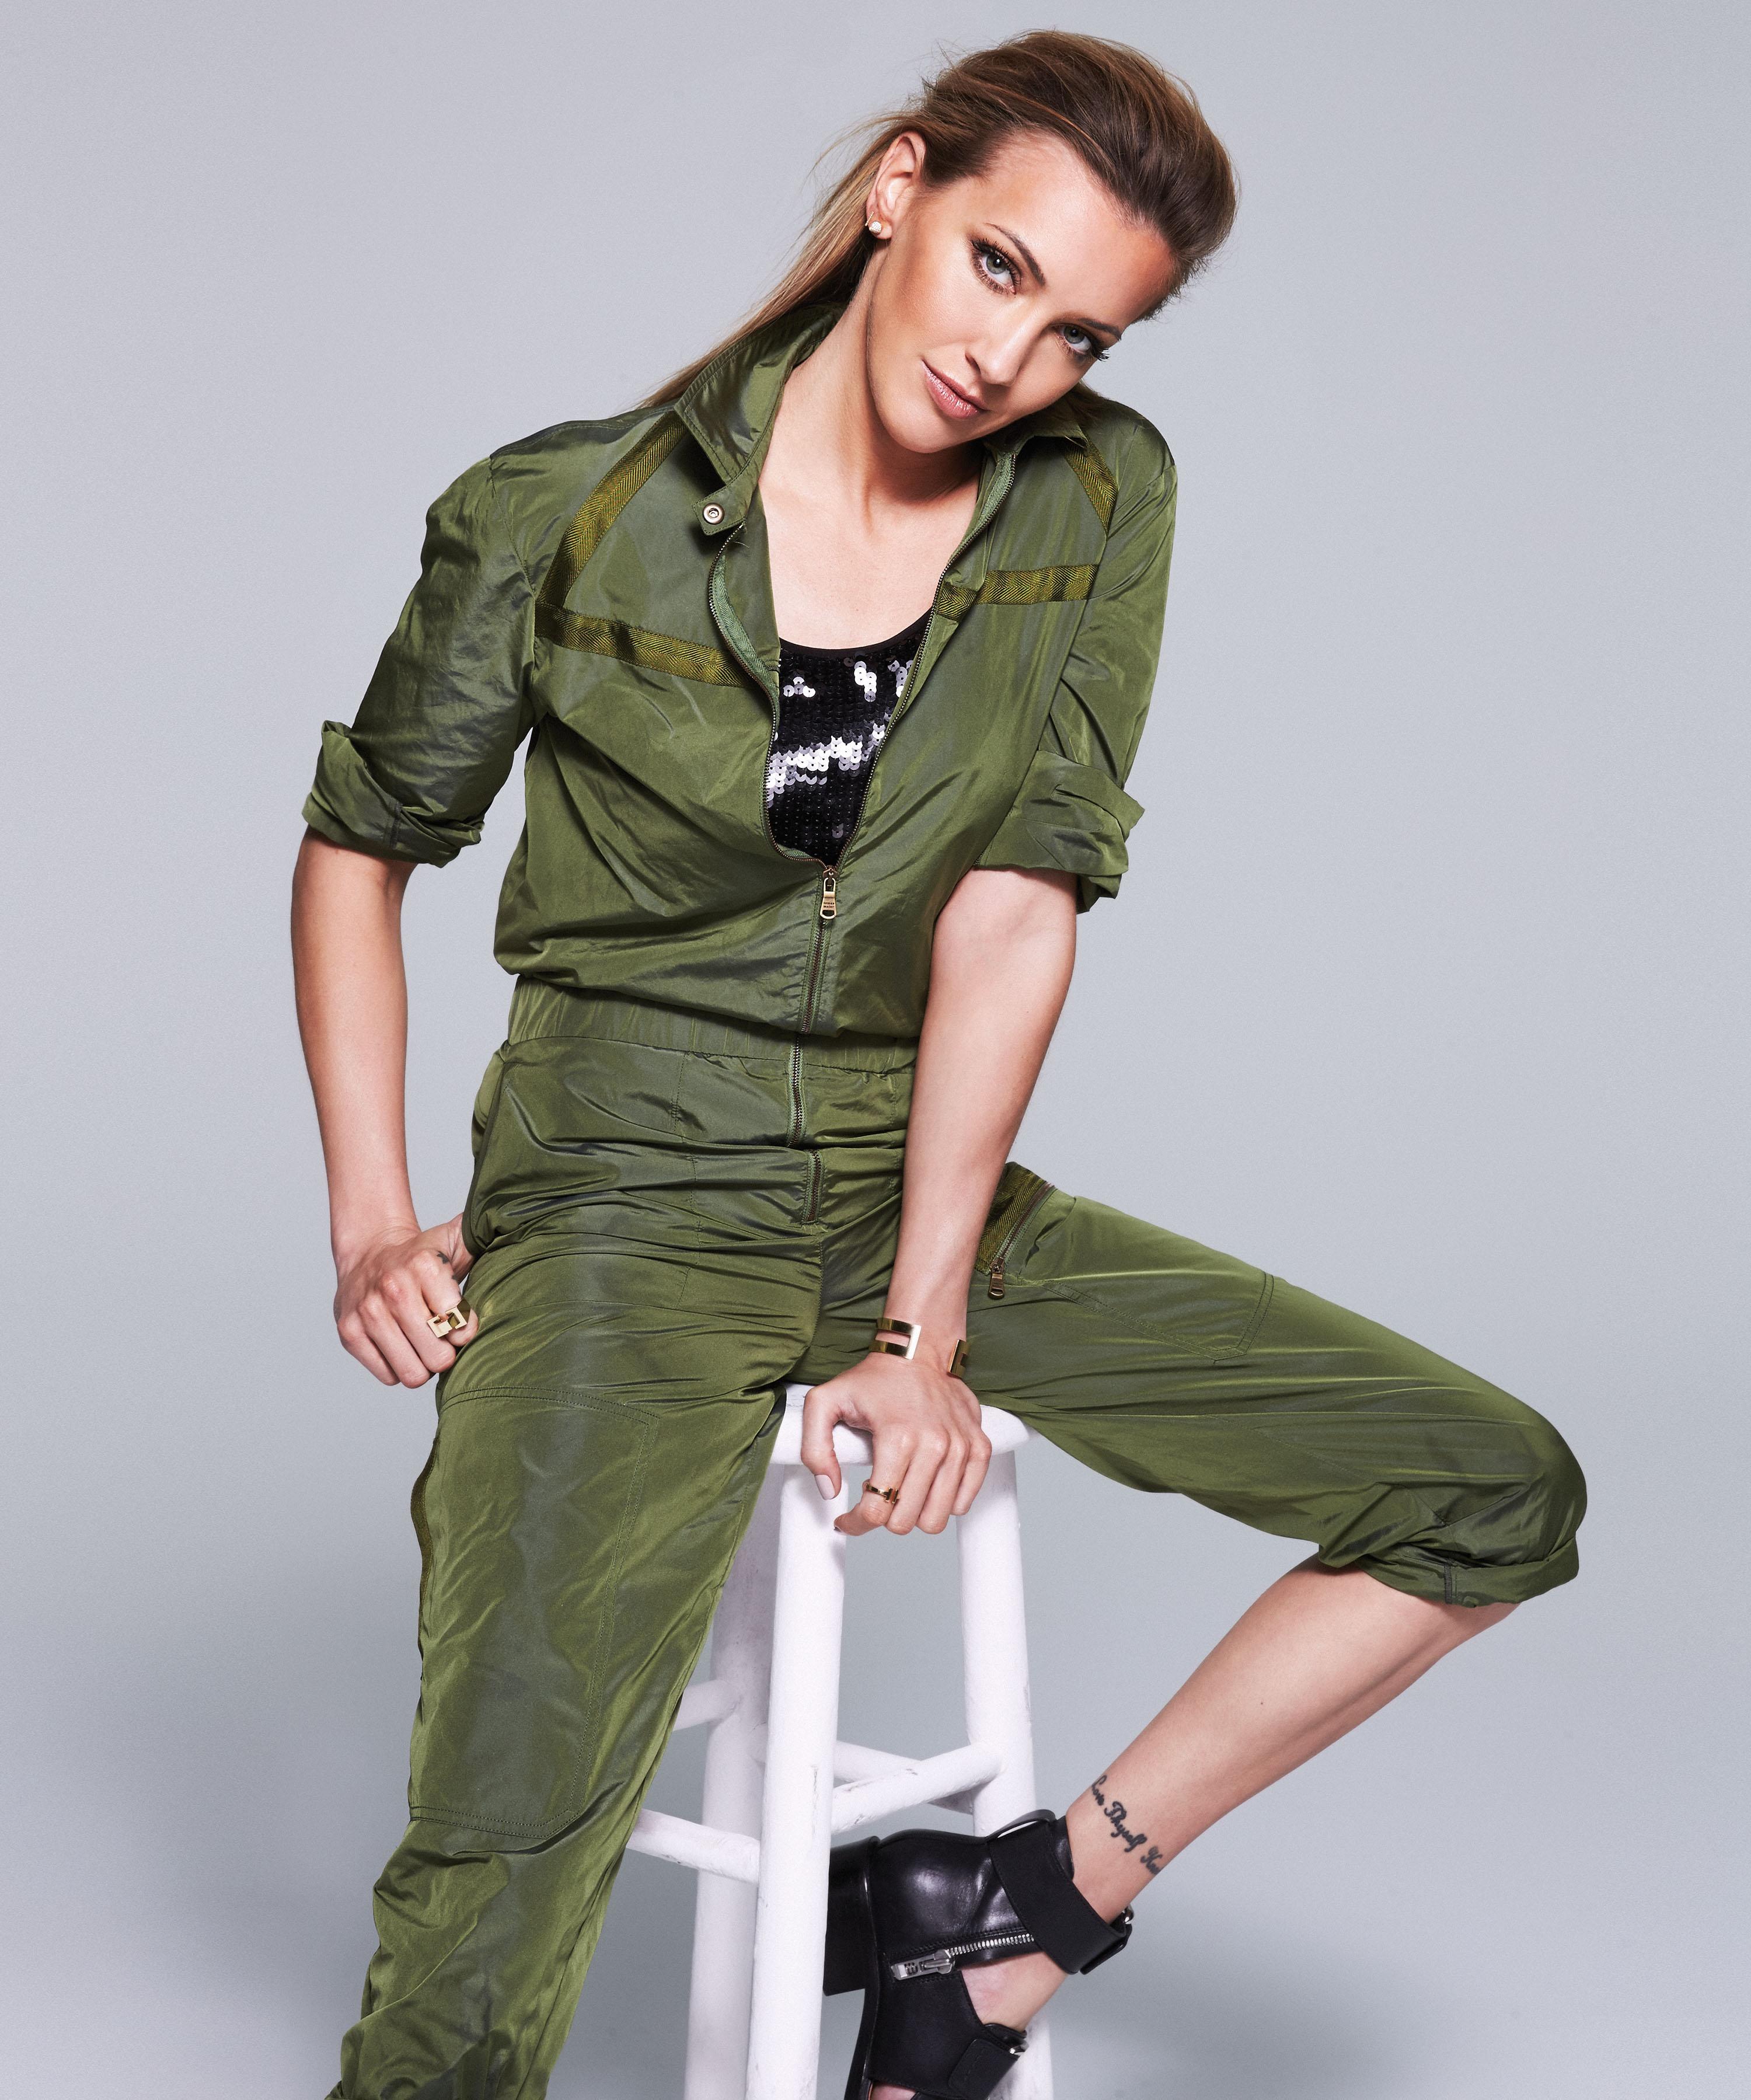 Katie-Cassidy-In-Bloom-Elyssa-Goodman-Masha-Maltsava-Seppe-Tirabassi-Fort-Lauderdale-Venice-Magazine-2